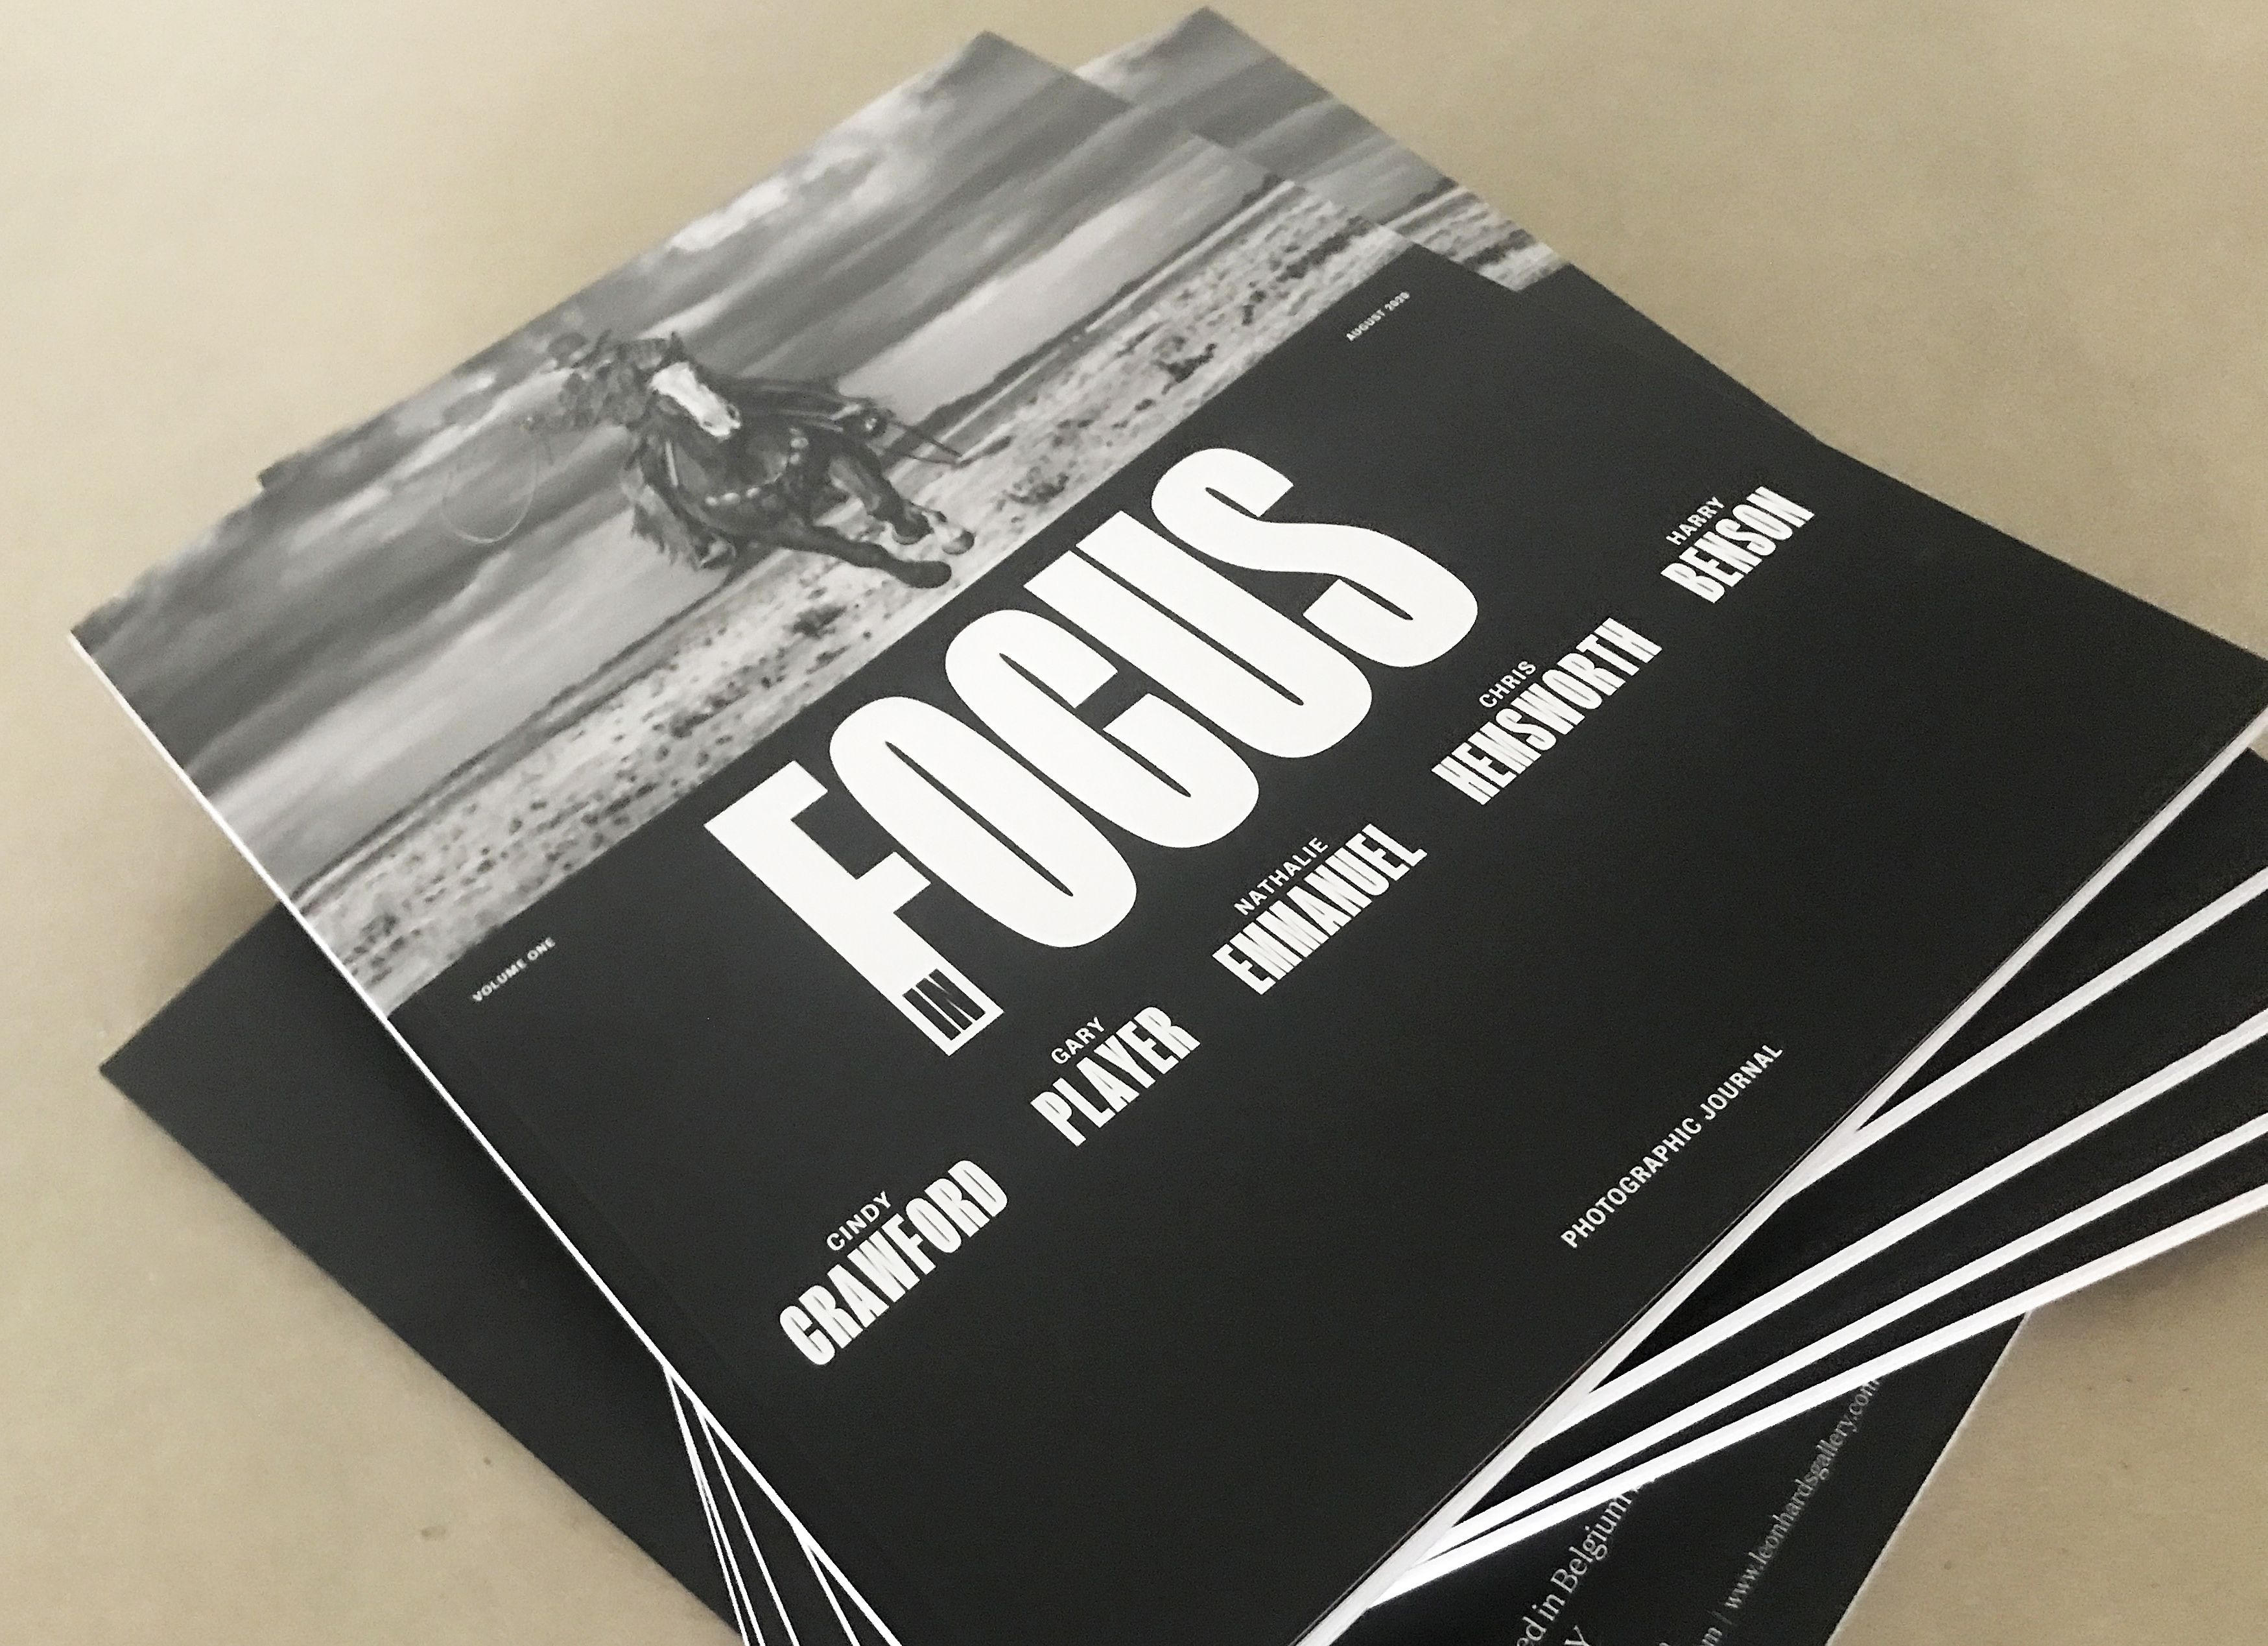 In Focus - David Yarrow - Leonhard's Gallery